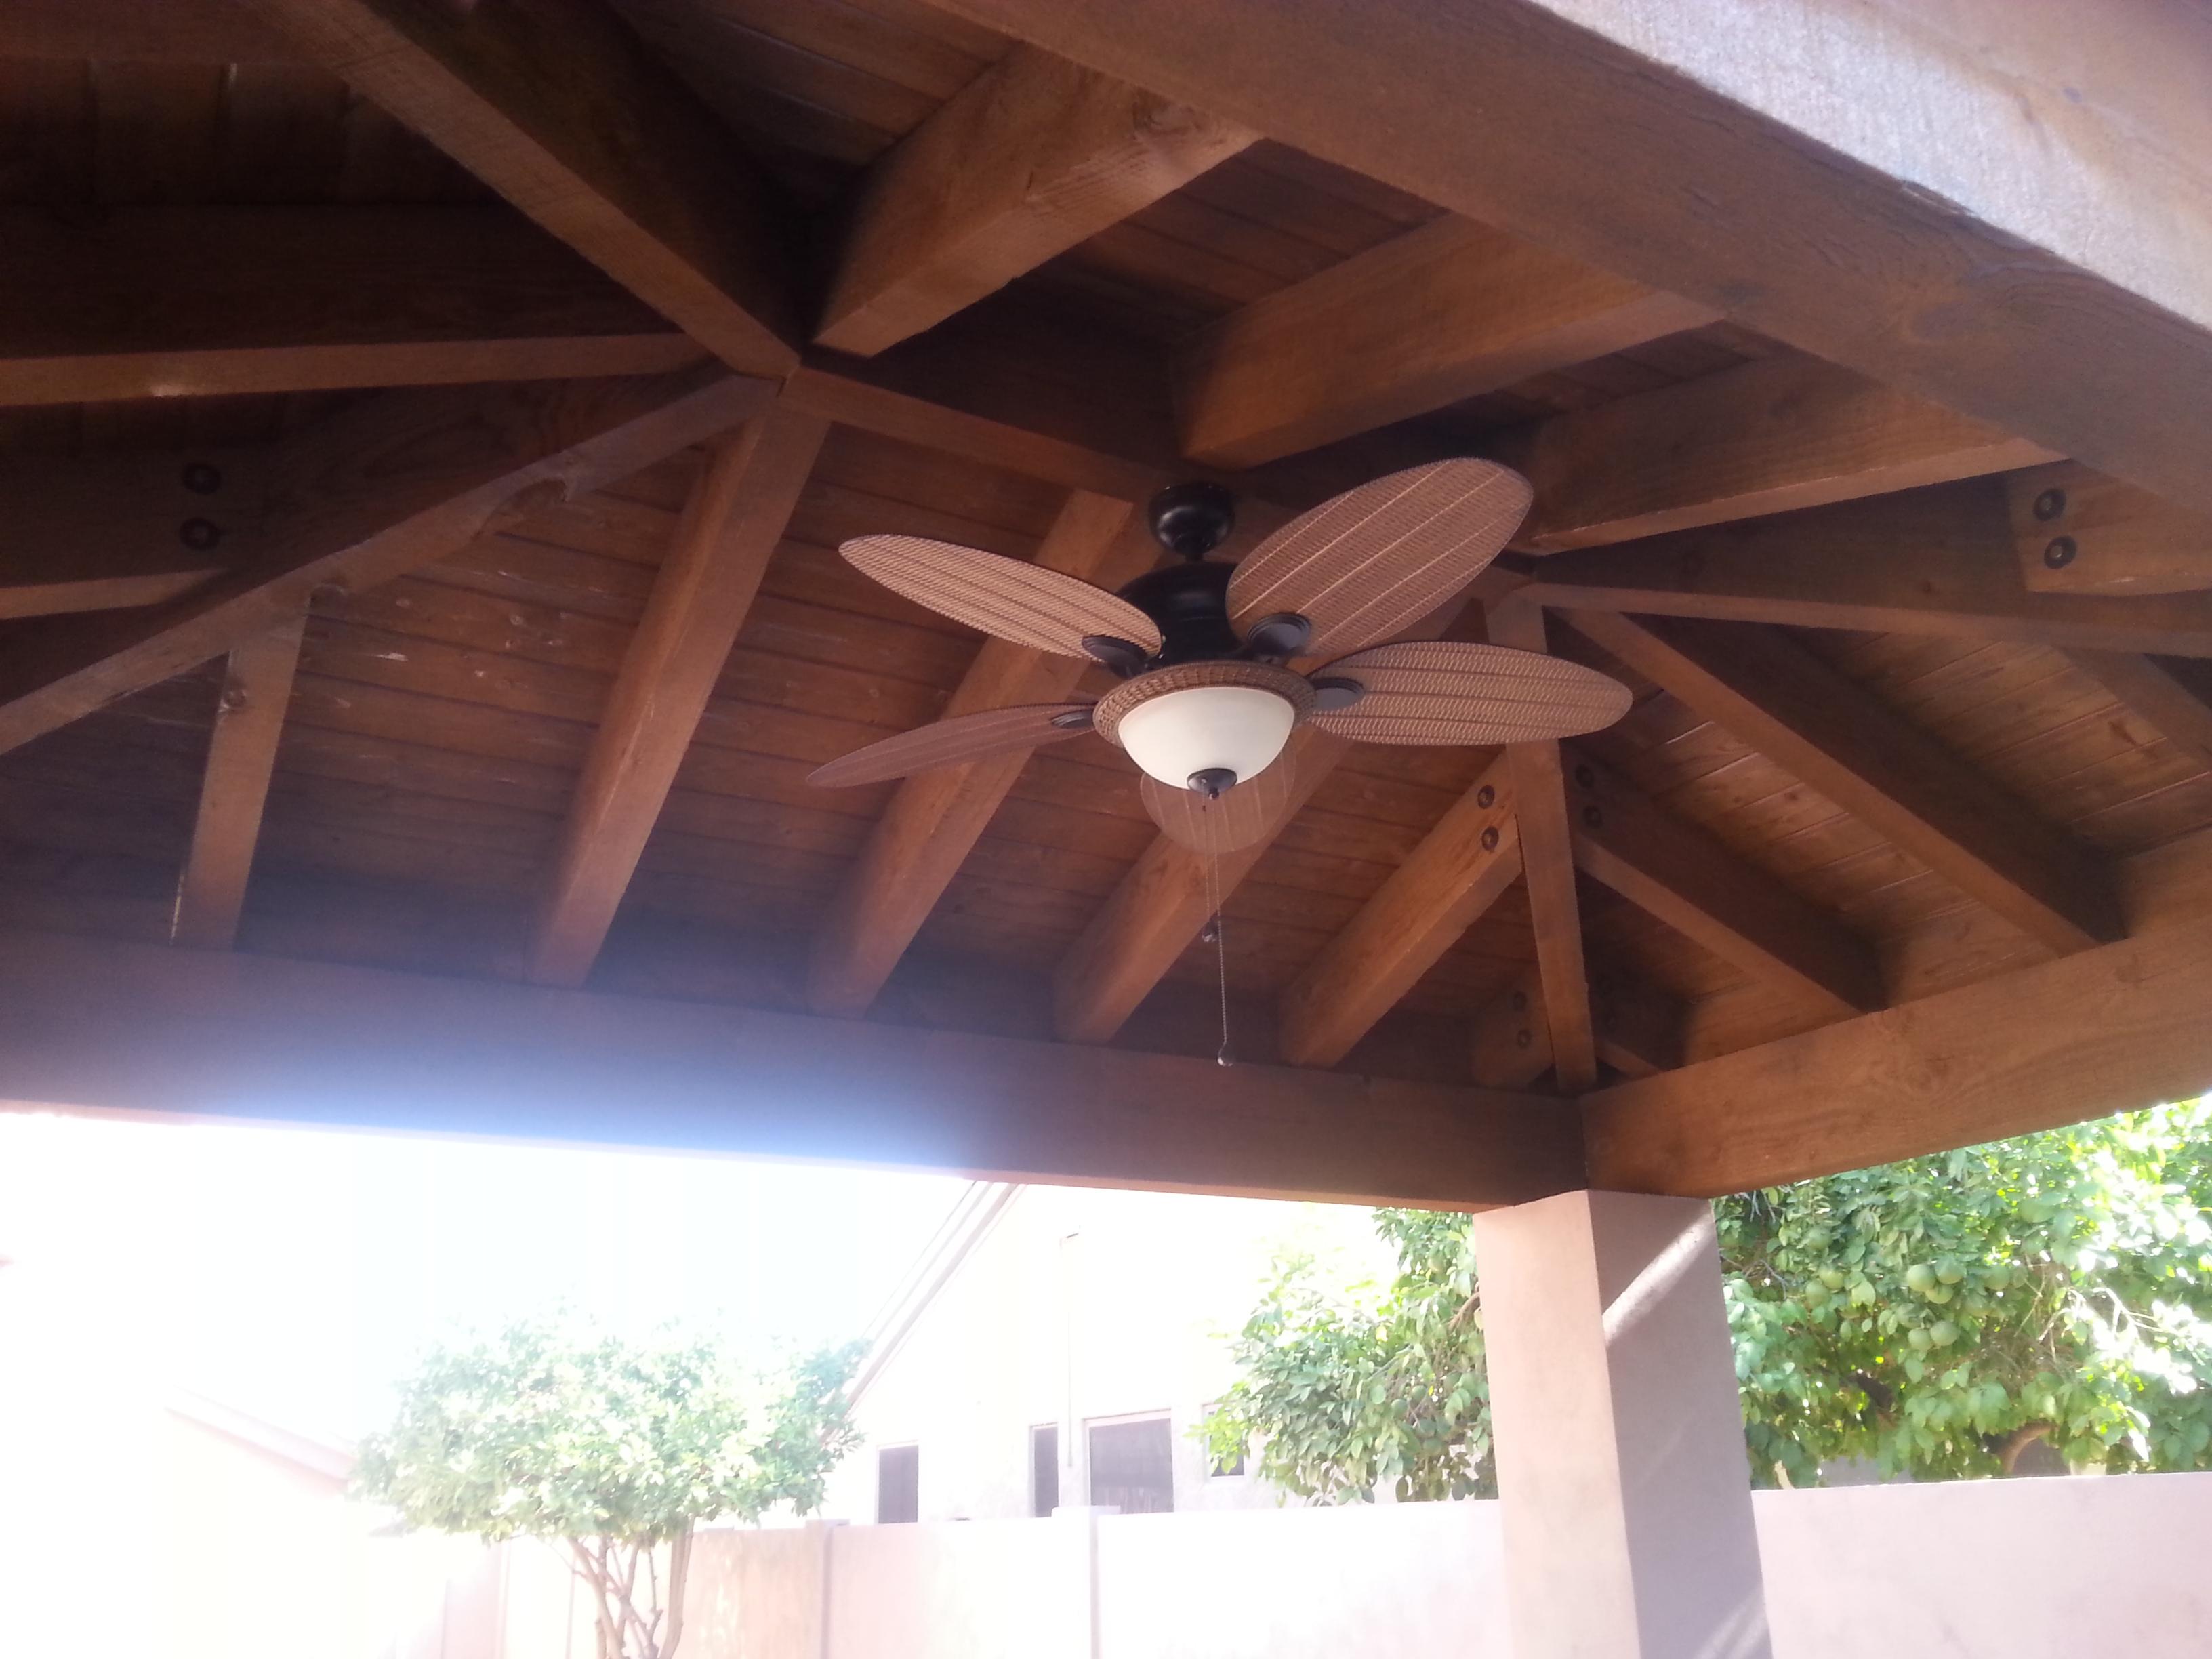 Wood ramada with electical fan